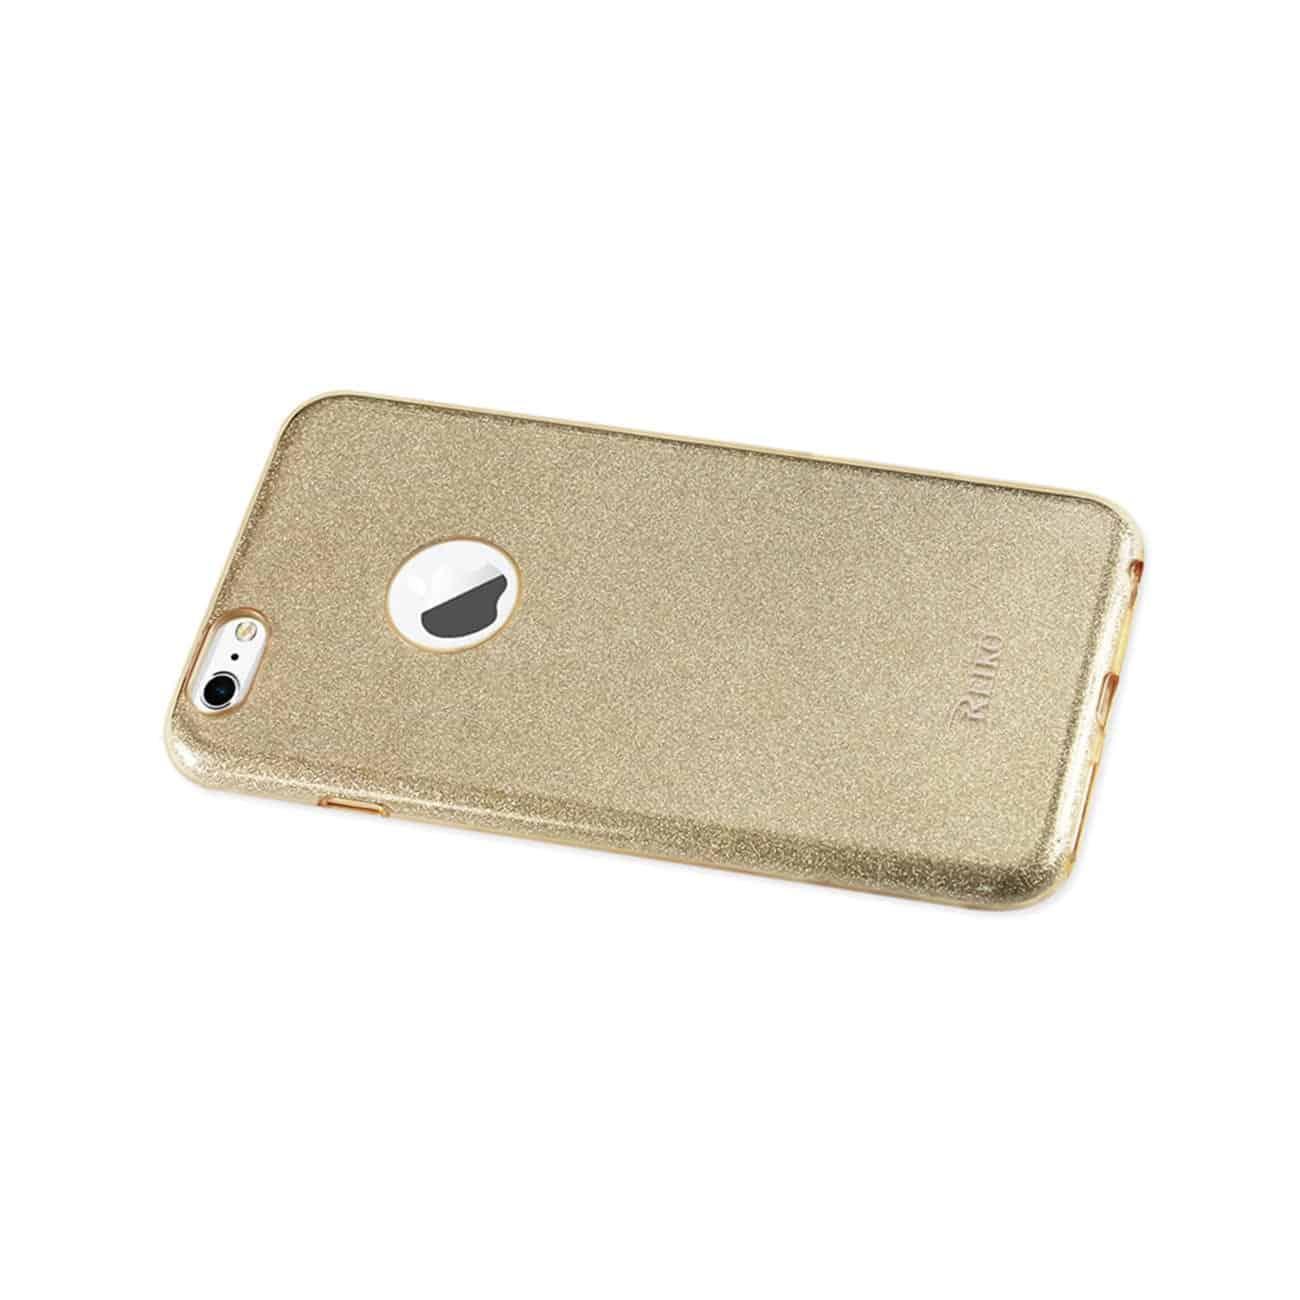 IPHONE 6 PLUS/ 6S PLUS SHINE GLITTER SHIMMER HYBRID CASE IN GOLD